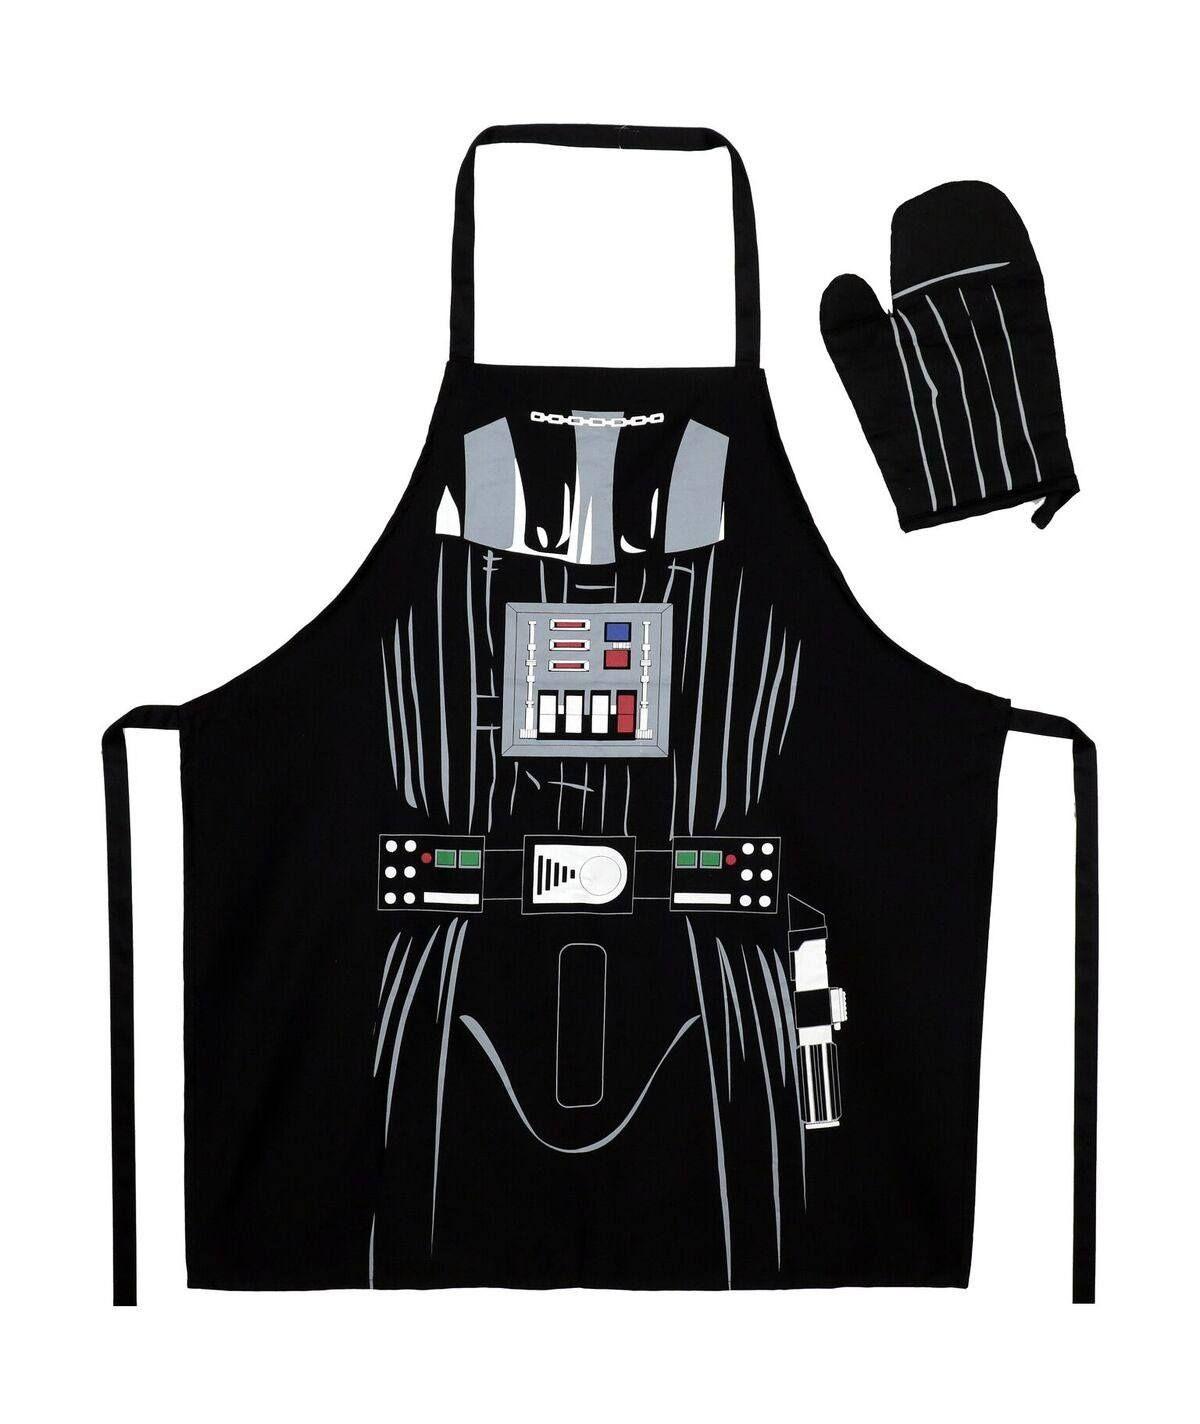 Star Wars Cooking Zástěra With Oven Mitt Darth Vader SD Toys